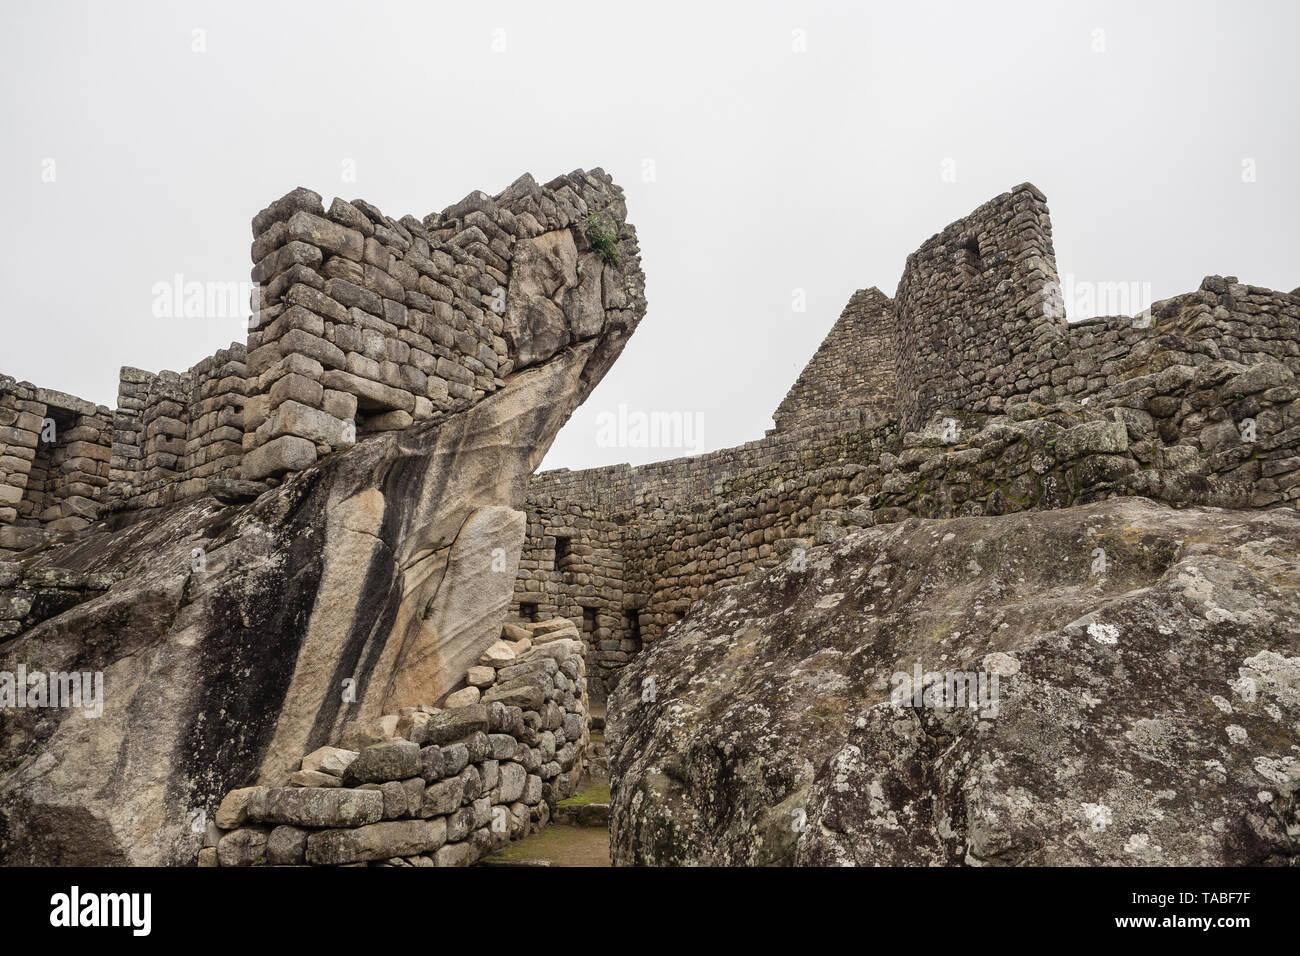 Detail of the architecture in the Inca ruins of Machu Picchu, Cuzco Peru - Stock Image